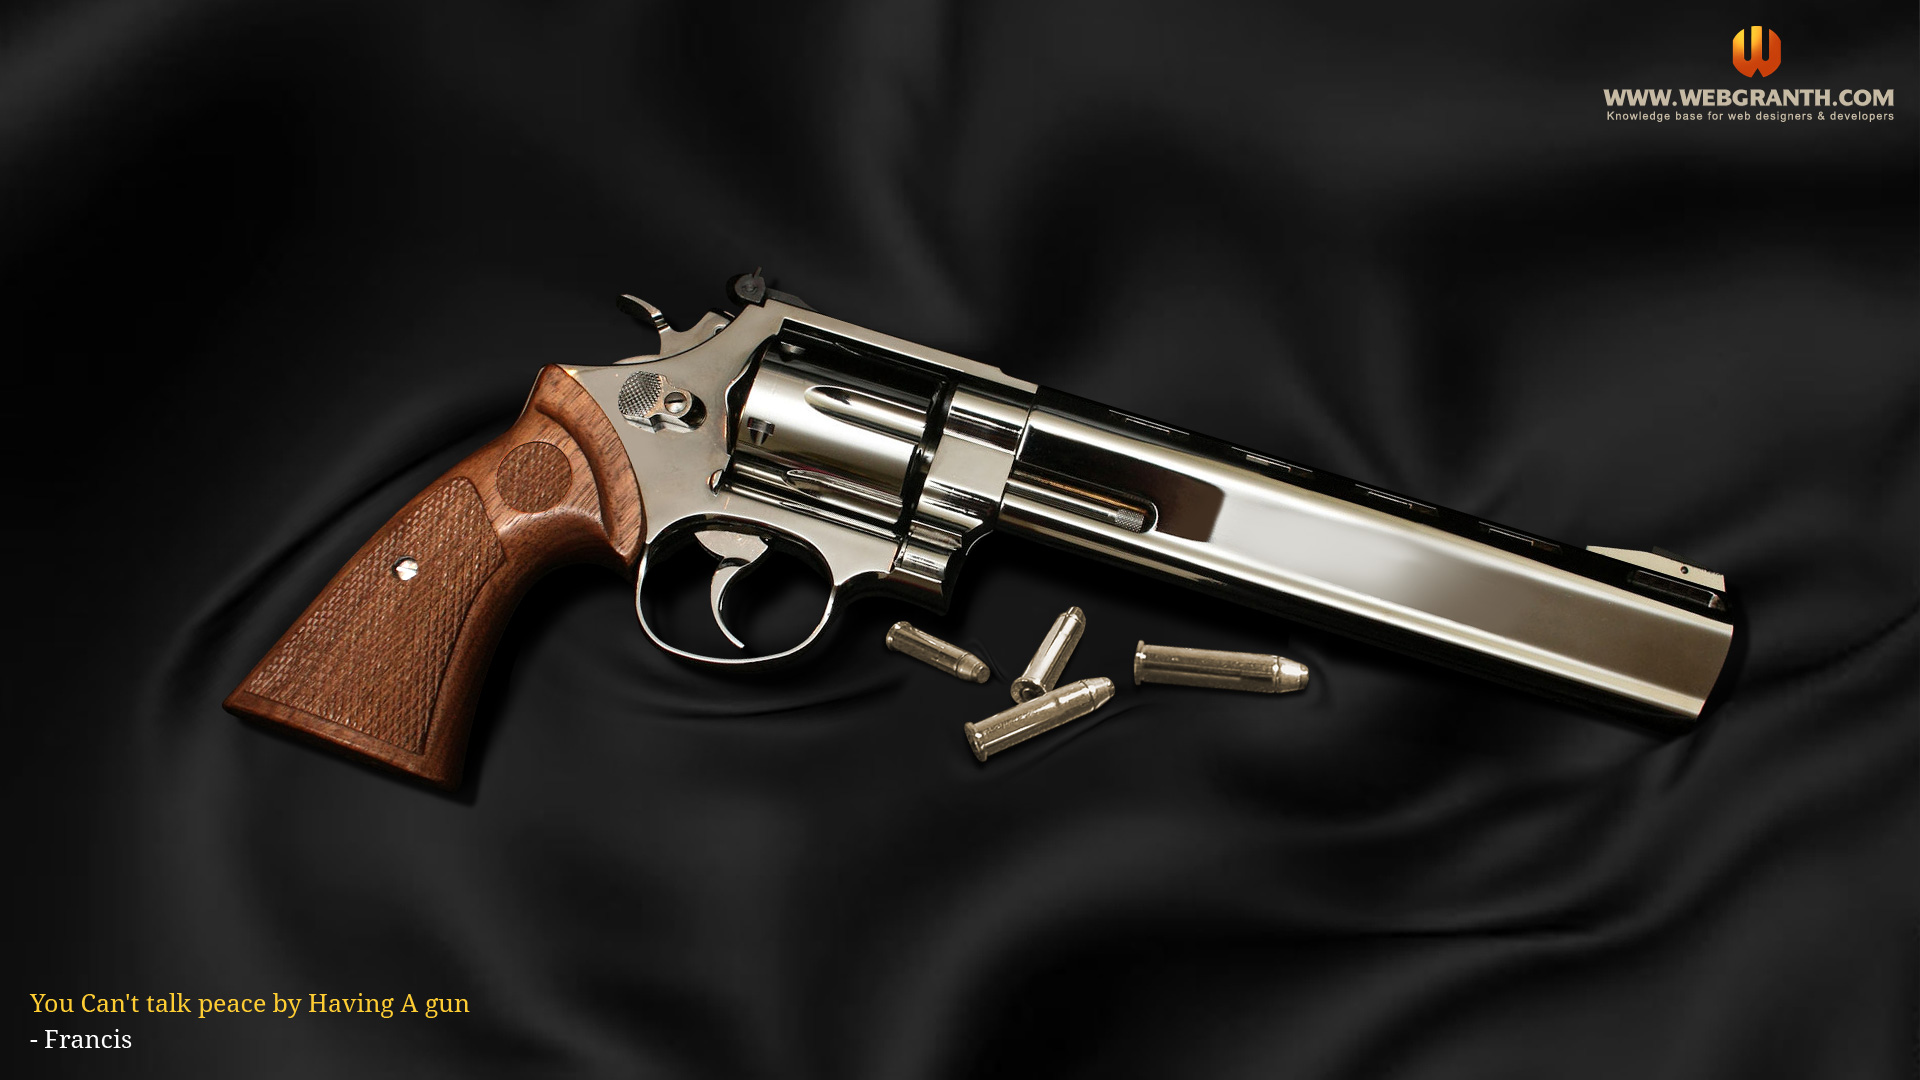 HD Guns Wallpaper: Download HD Guns & Weapons Wallpapers - Webgranth ...